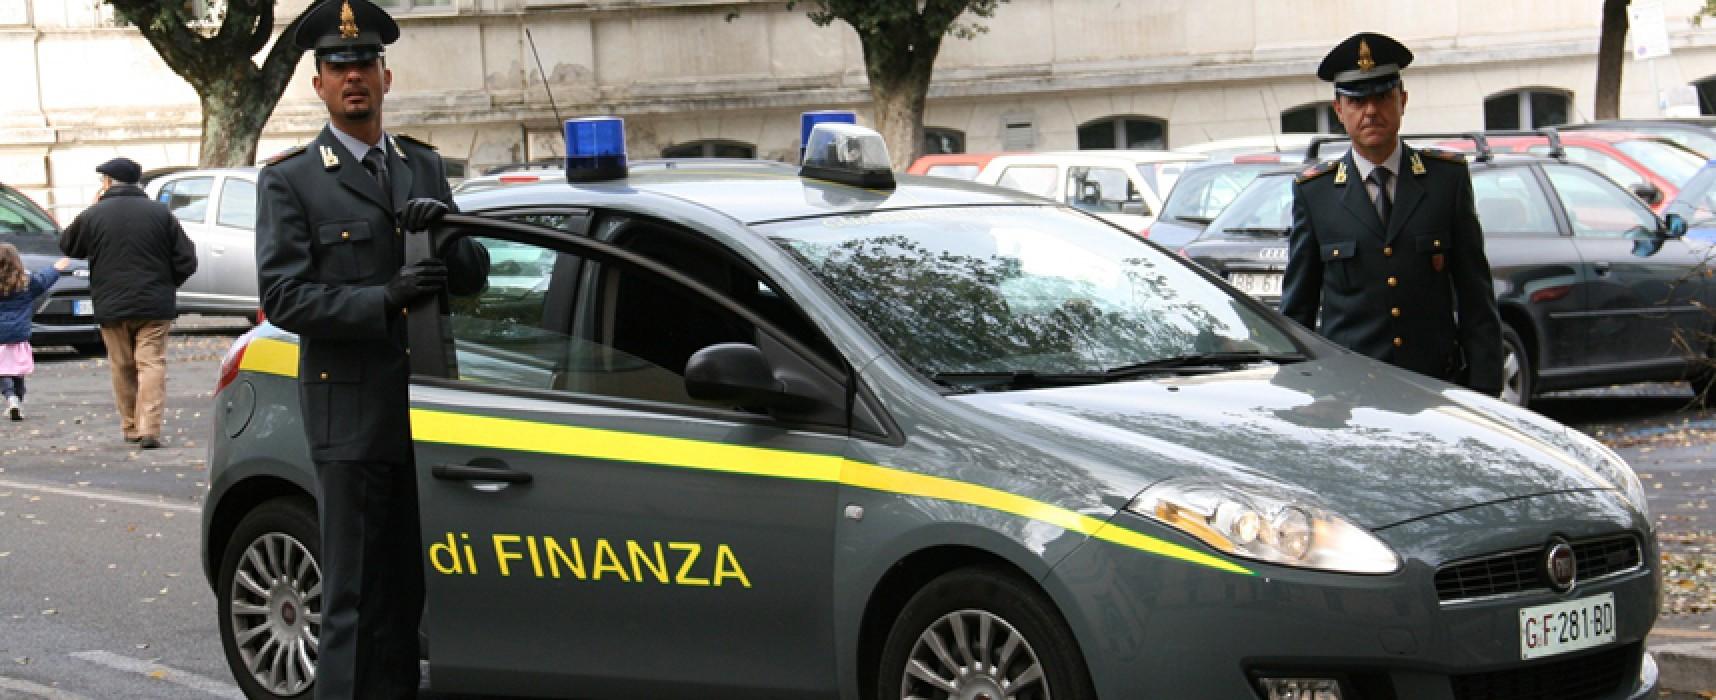 Pregiudicati arrestati ad Andria da Guardia di Finanza sospettati per furti a Bisceglie